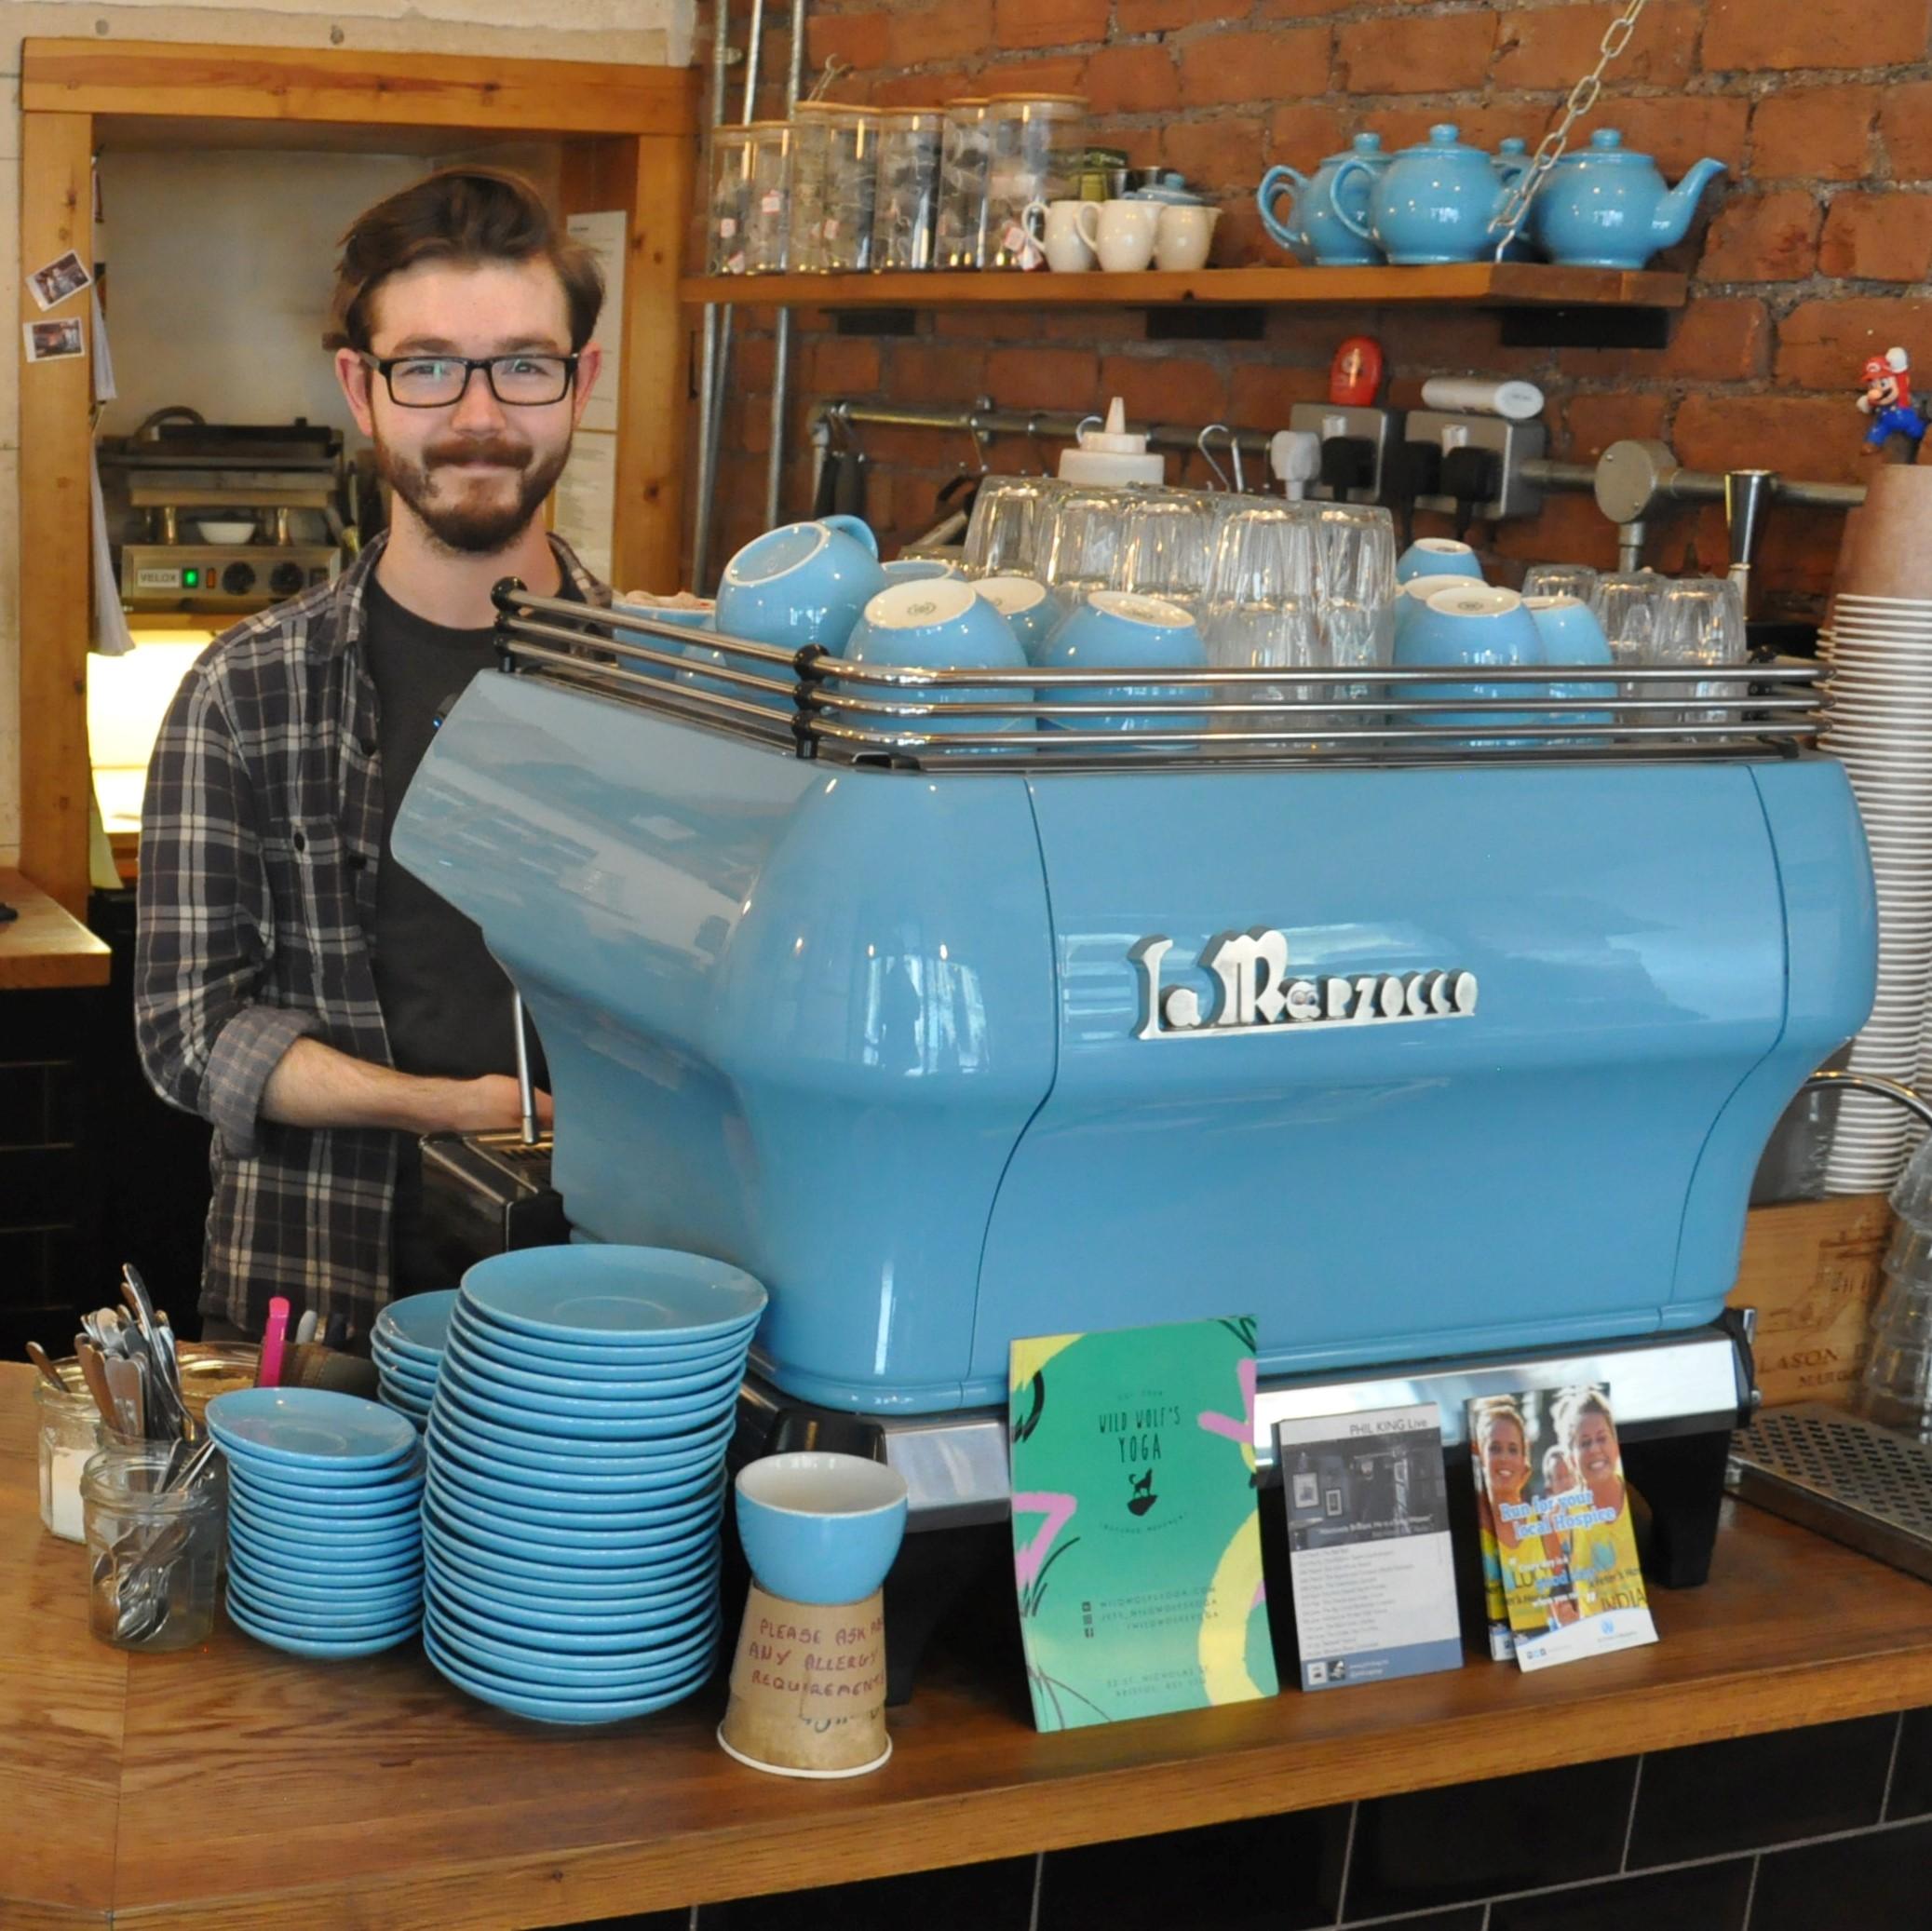 The lovely La Marzocco FB80 espresso machine, with its custom paint job, at Small St Espresso in Bristol.